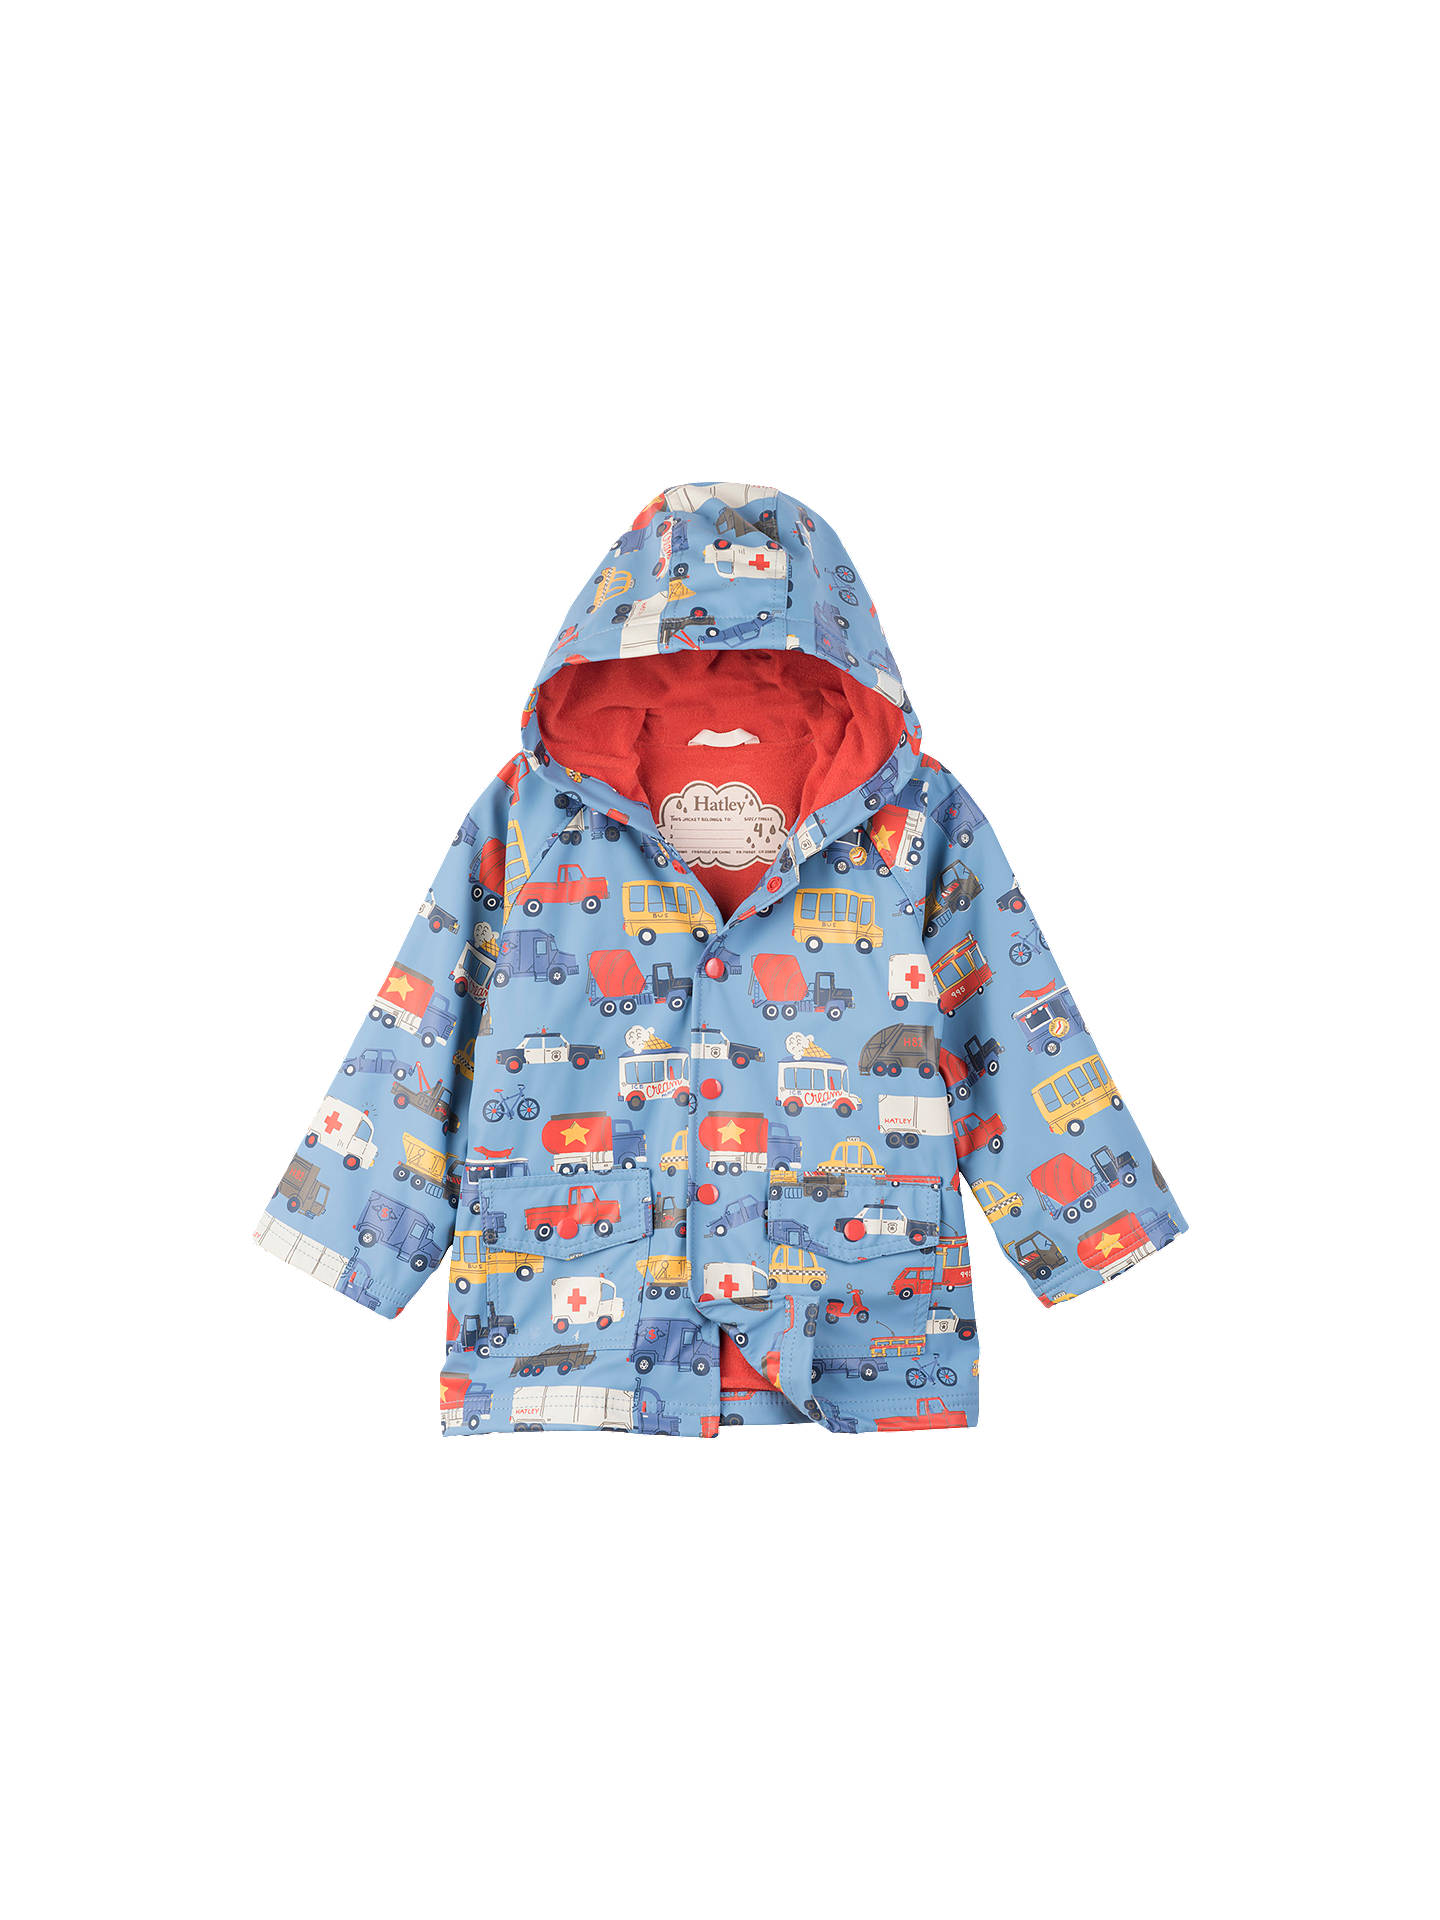 3c1a9dc81 Buy Hatley Boys' Car Print Rain Coat, Blue, 2 years Online at johnlewis ...